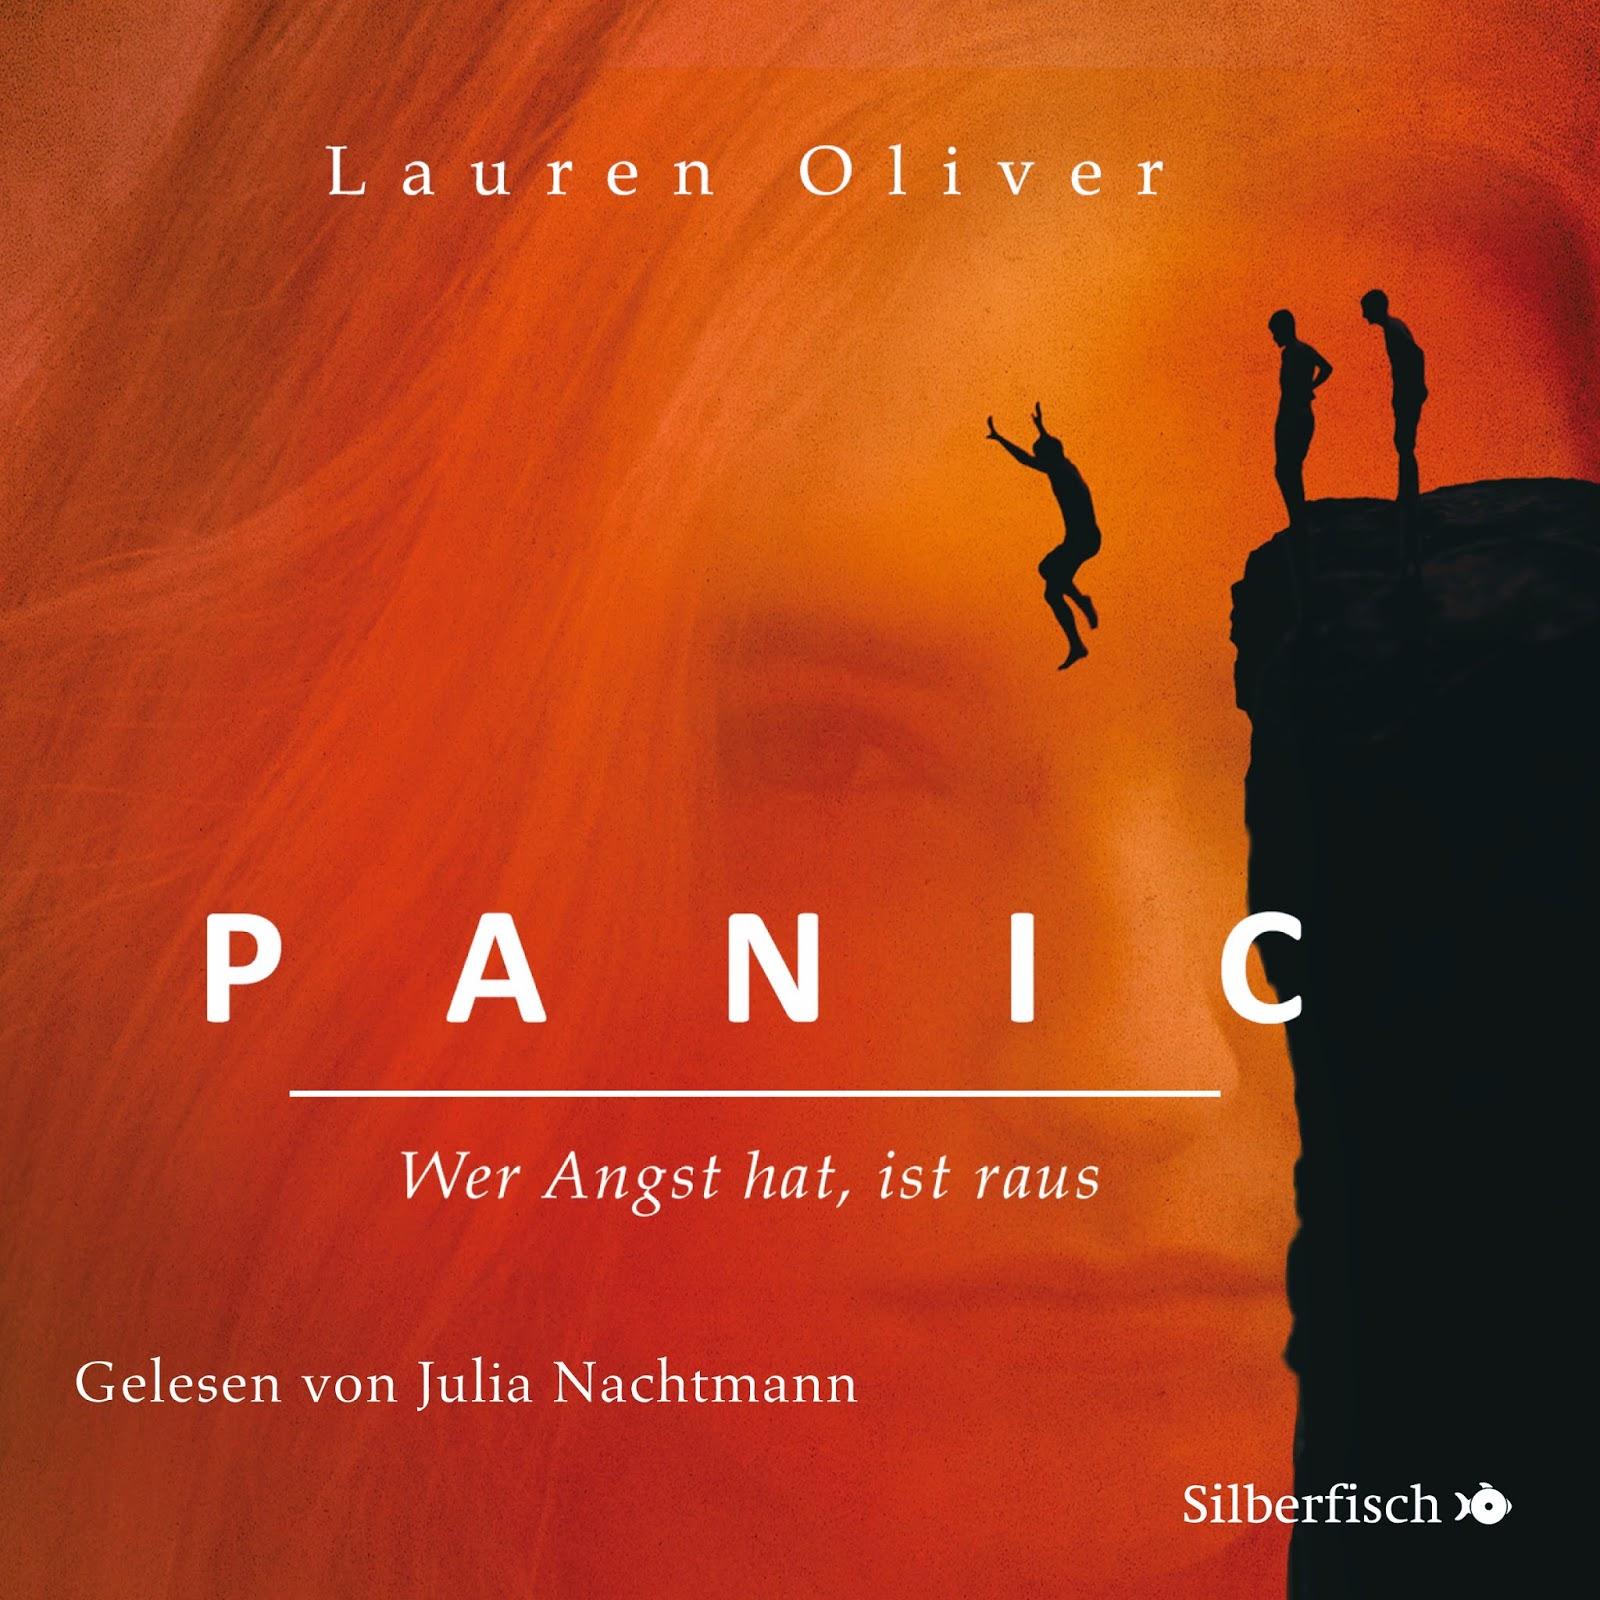 http://www.amazon.de/Panic-Wer-Angst-hat-raus/dp/386742182X/ref=sr_1_1_twi_1?ie=UTF8&qid=1423320002&sr=8-1&keywords=panic+h%C3%B6rbuch+audio+cd